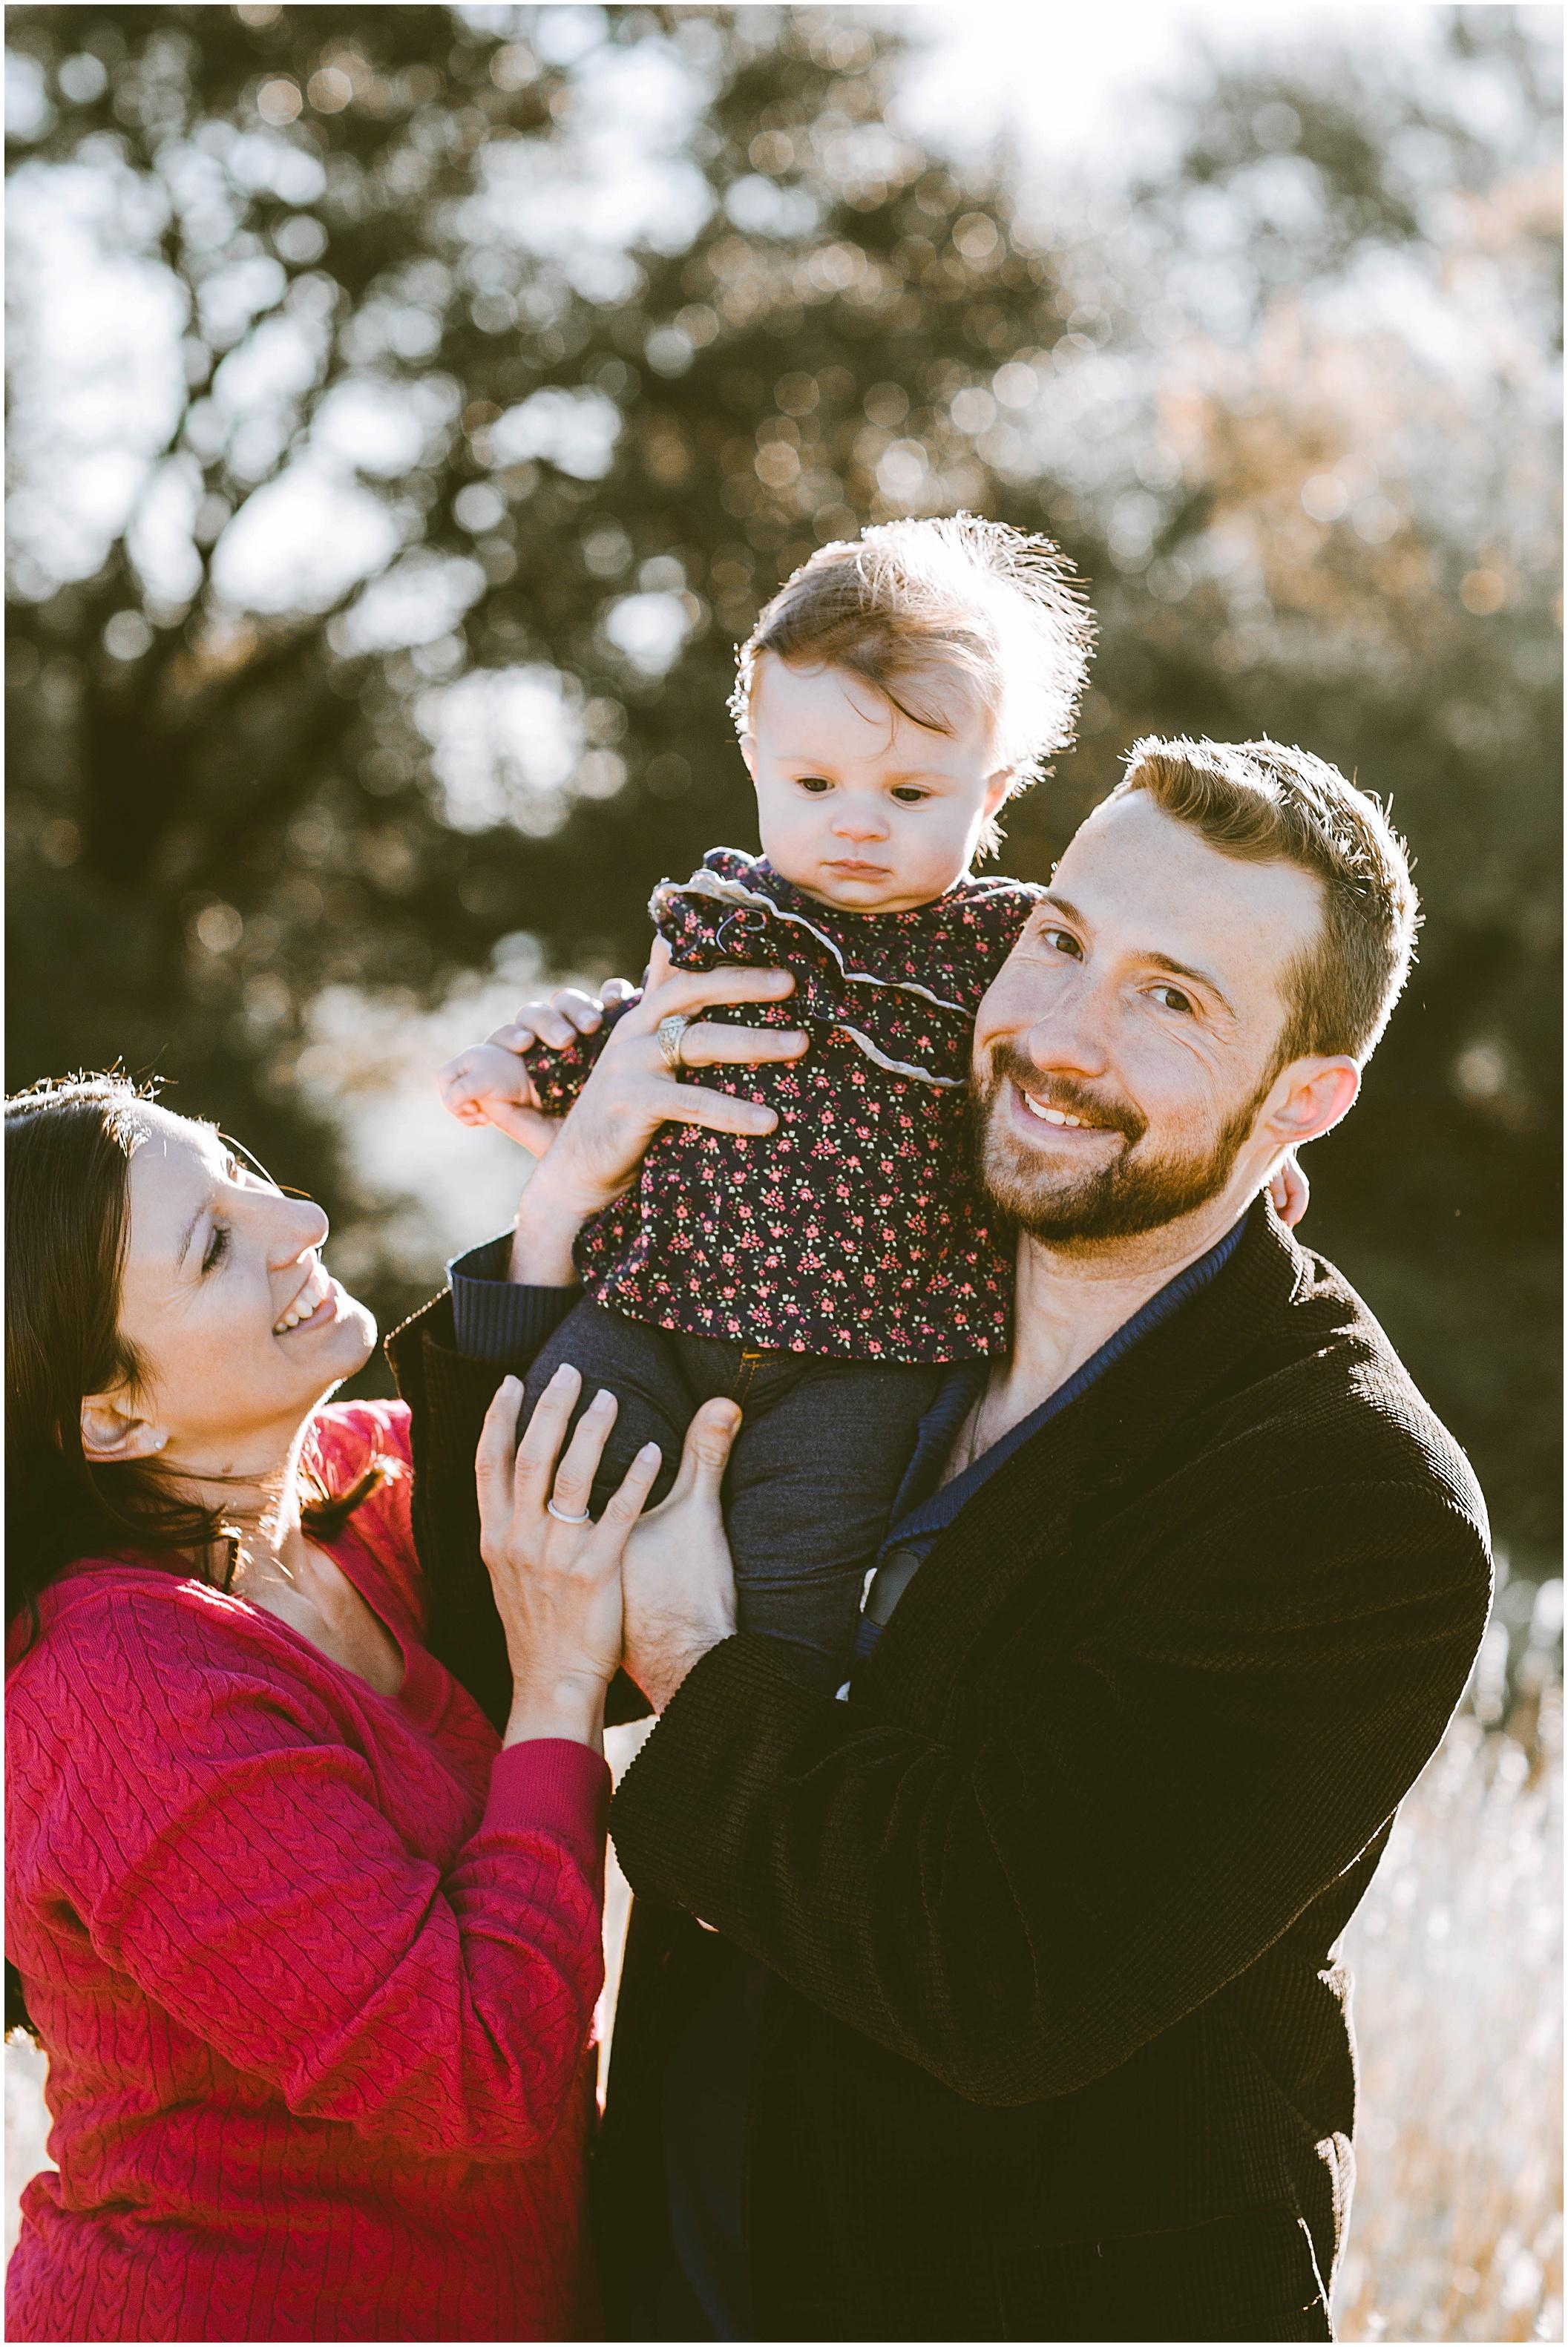 Austin Texas Family Photography Session_0064.jpg